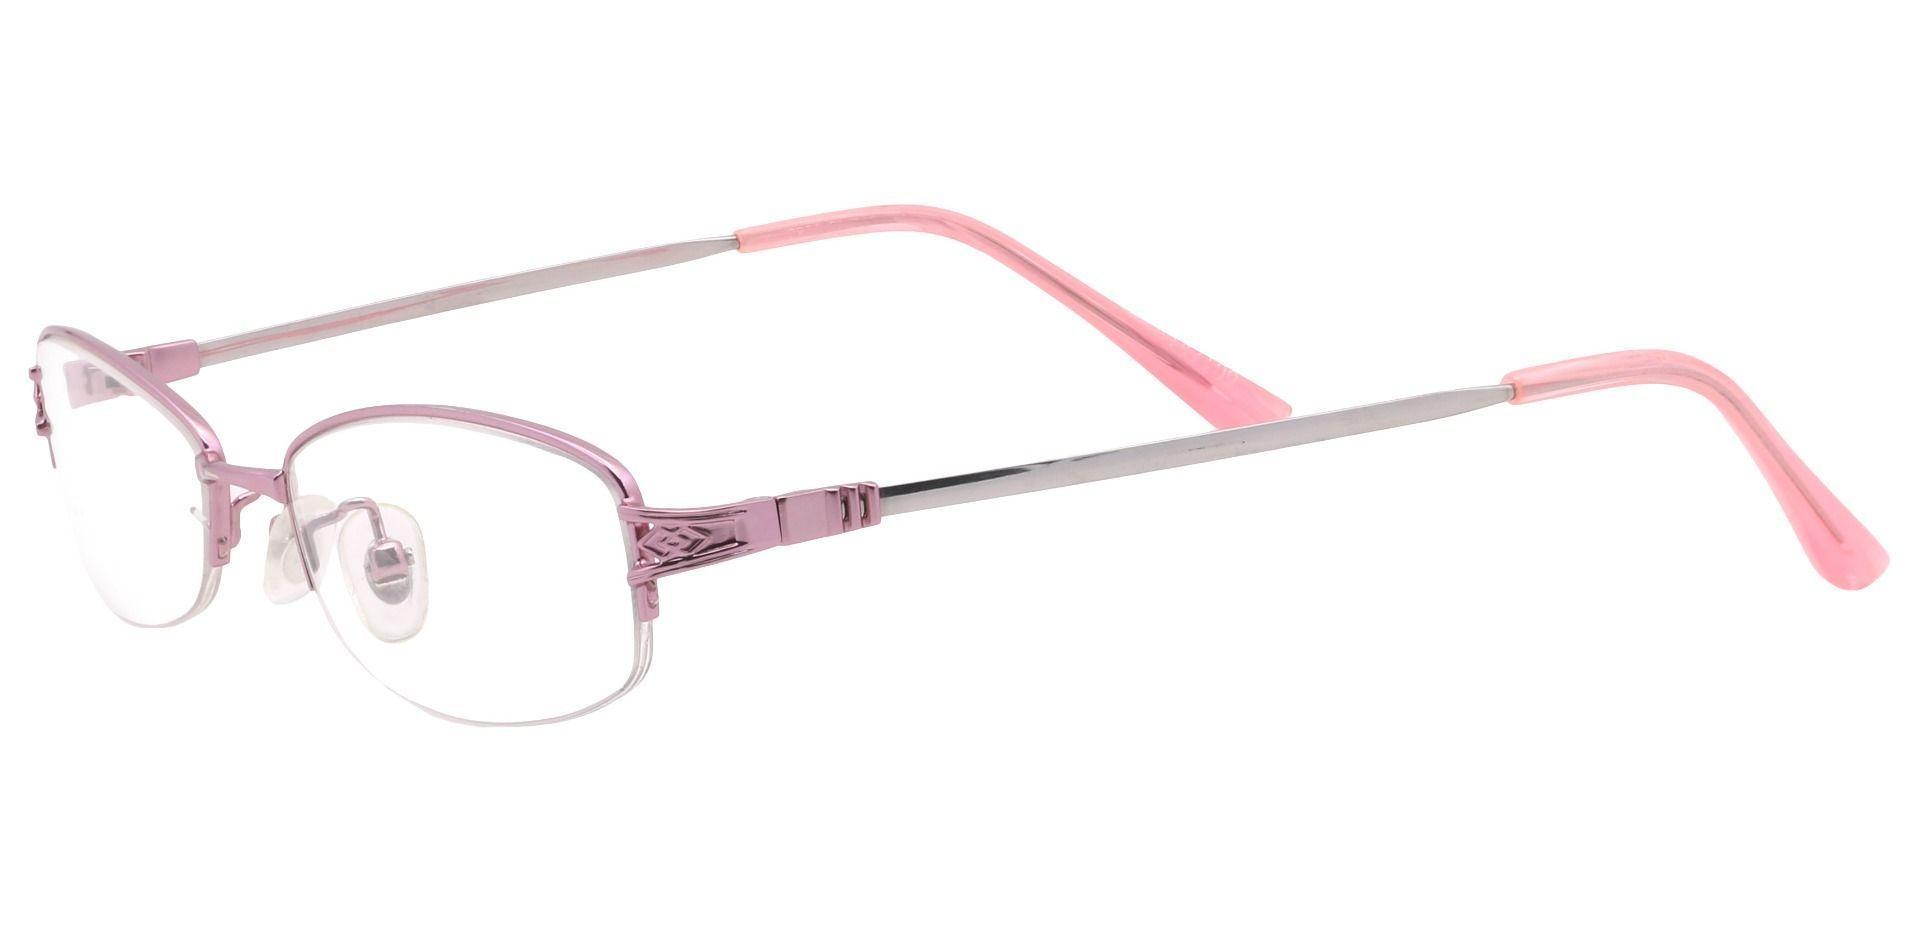 Delta Oval Single Vision Glasses - Pink